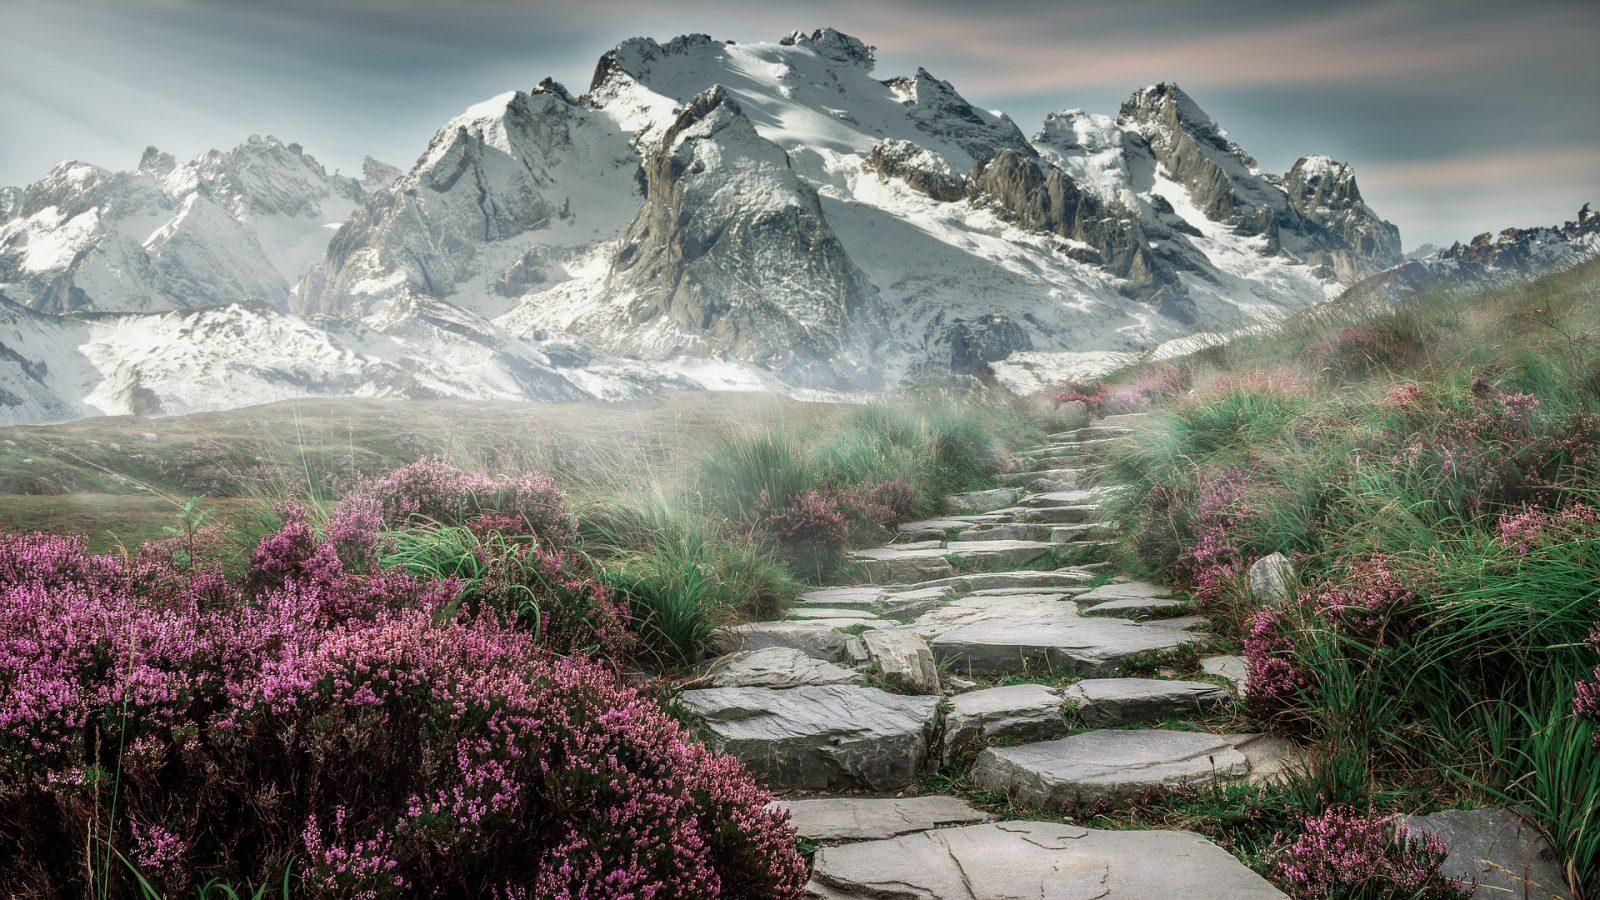 mountain-landscape-2031539_1920